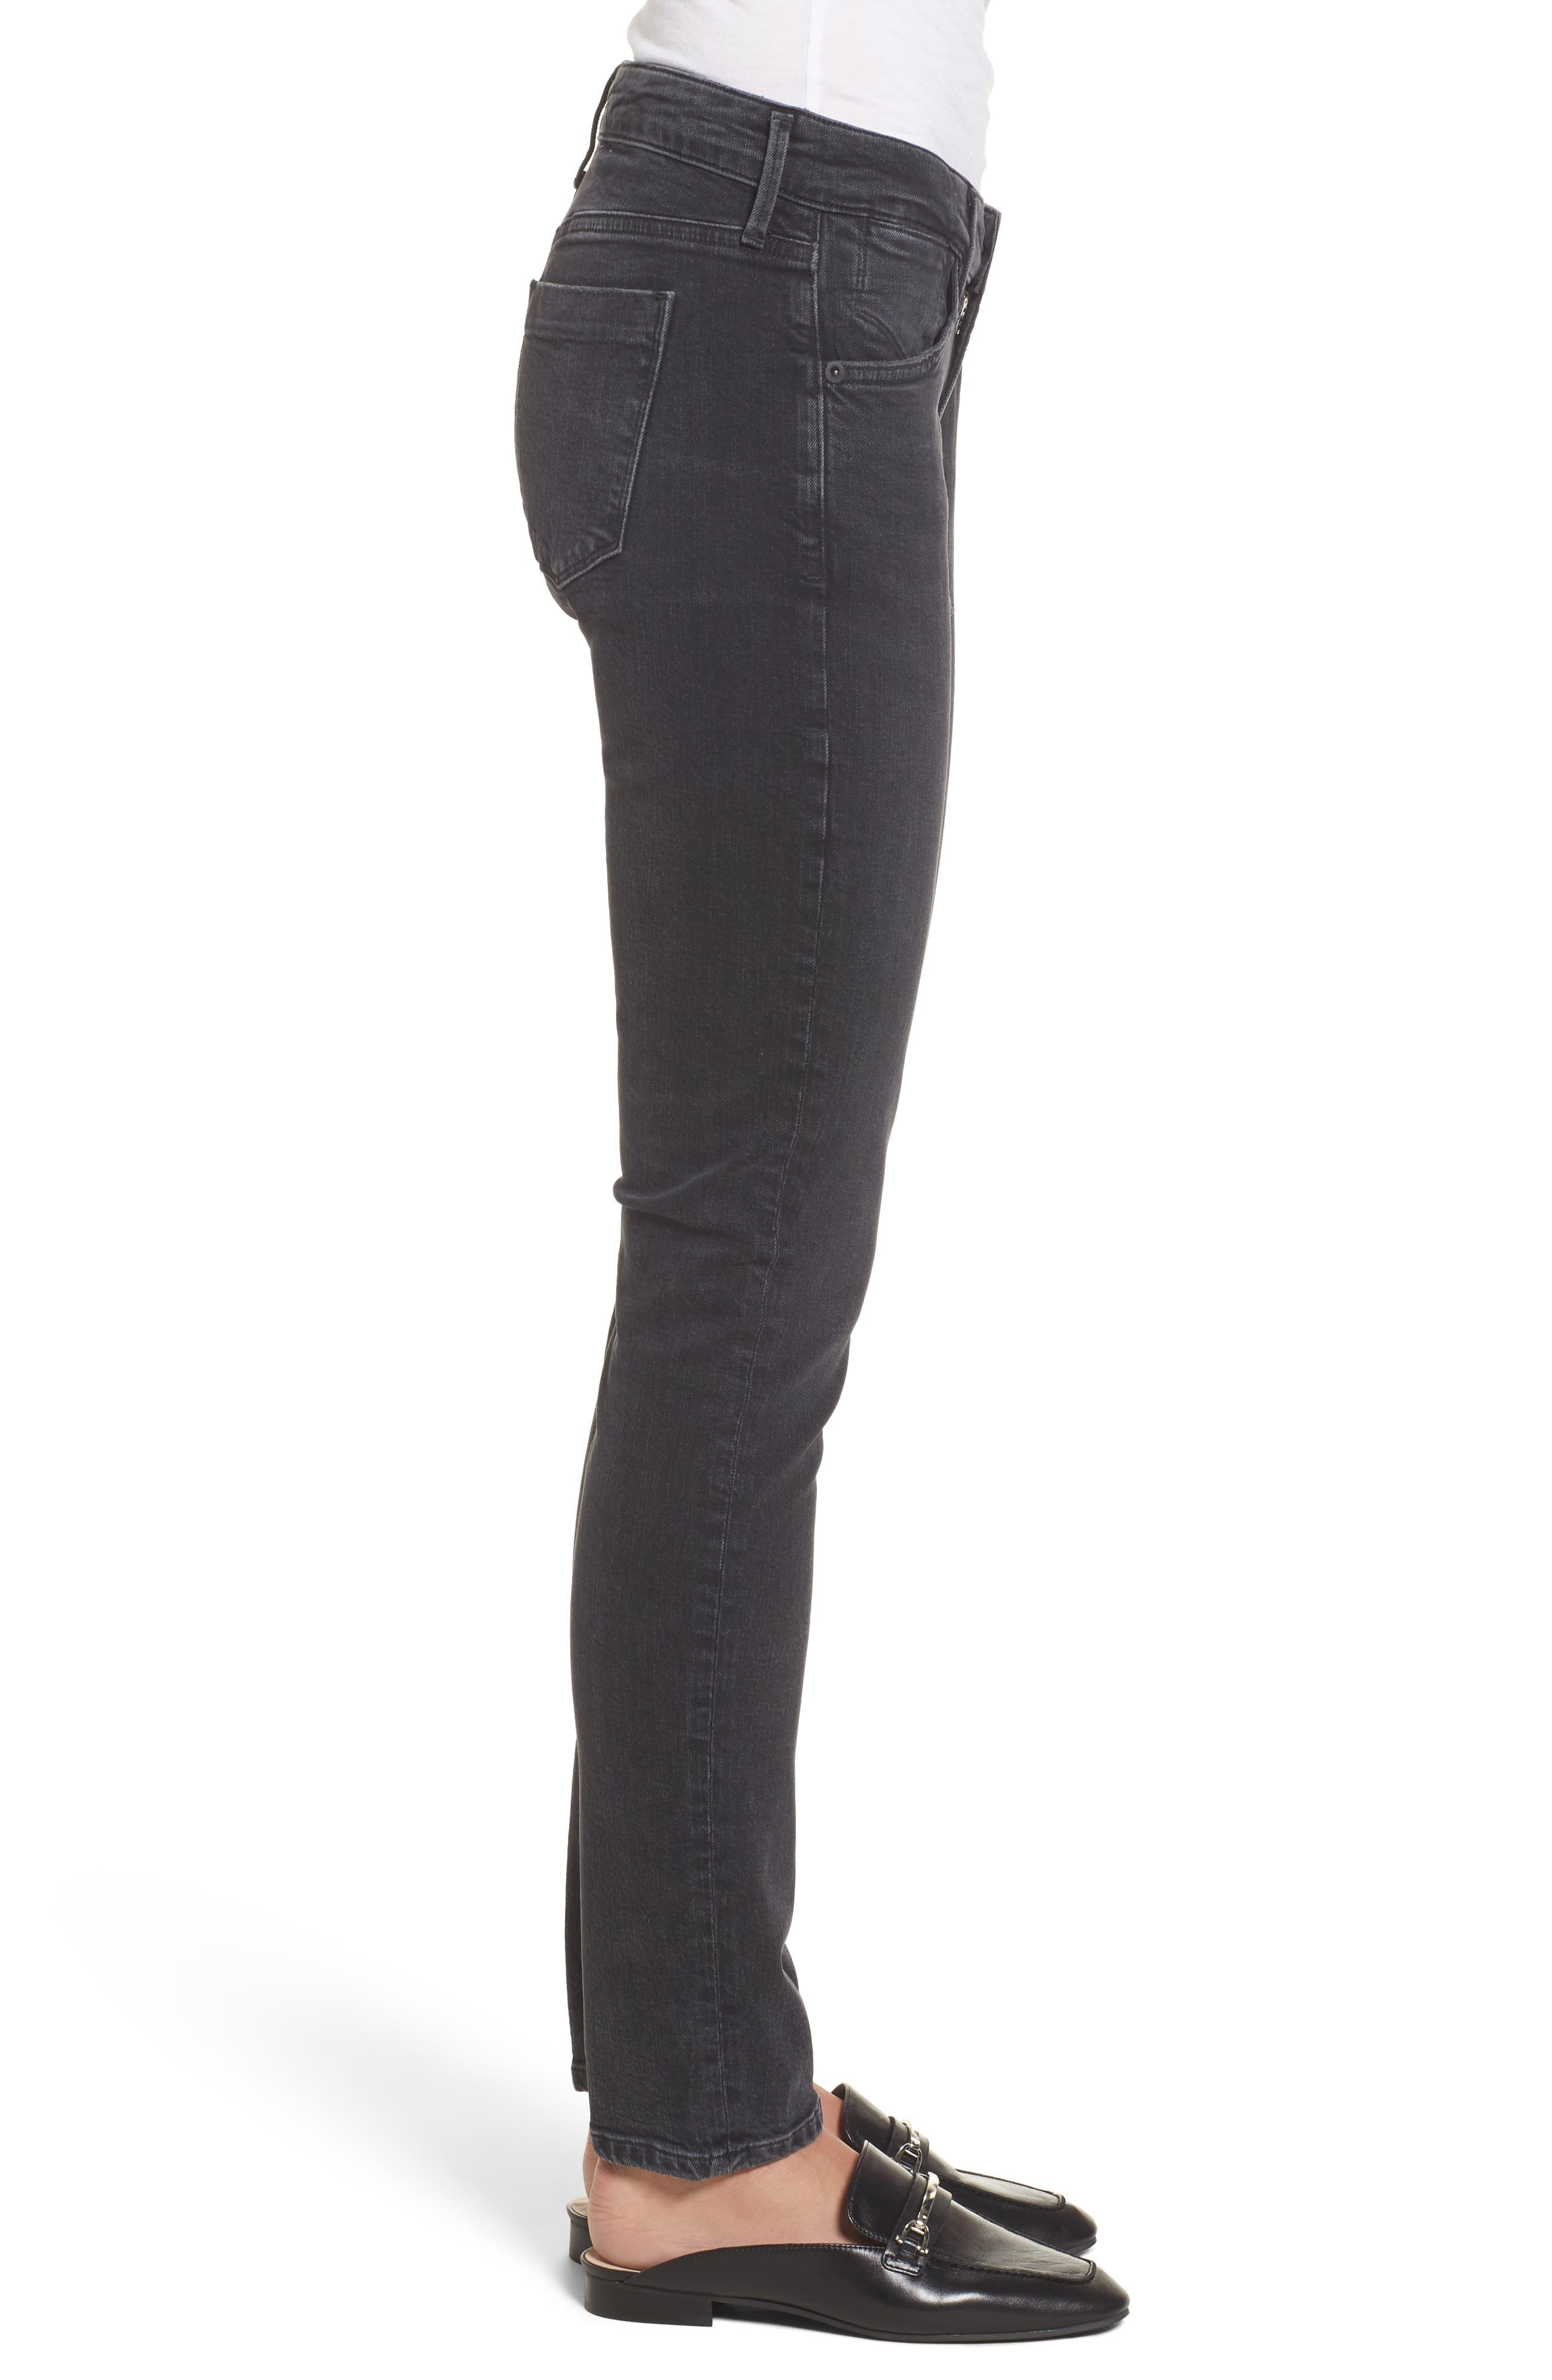 Chloe Low Rise Slim Jeans,                             Alternate thumbnail 3, color,                             072